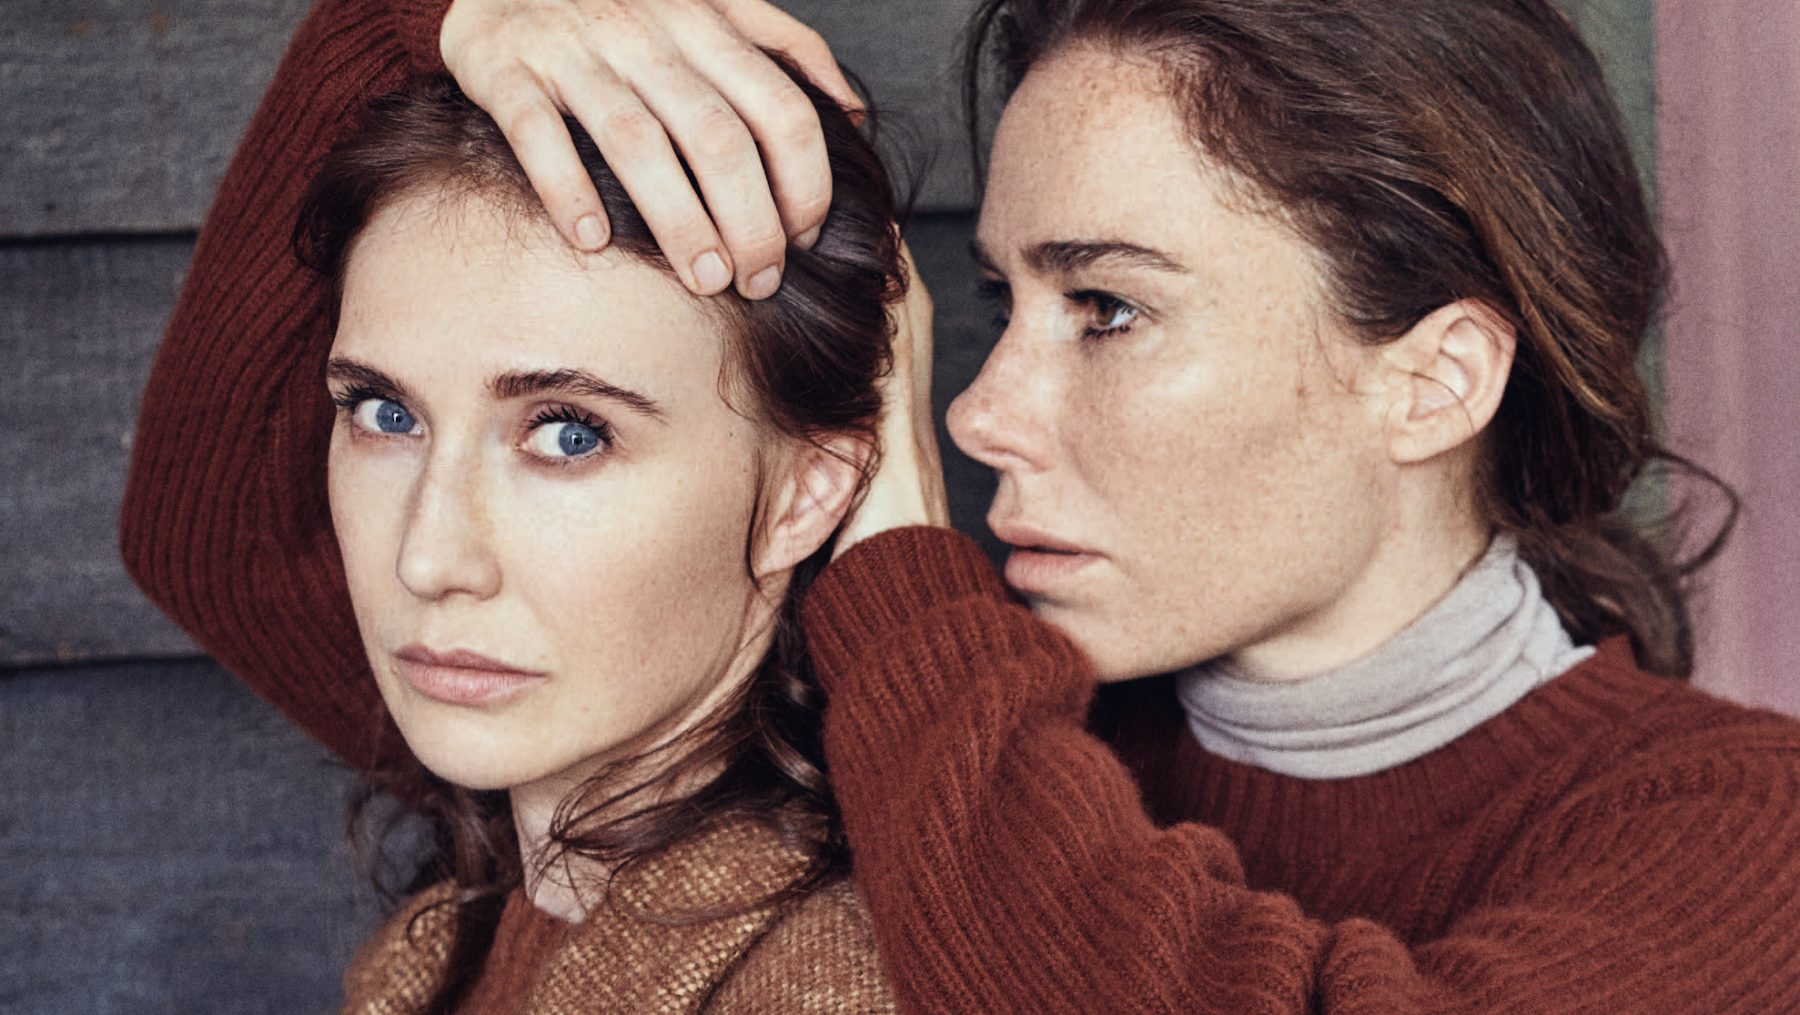 Carice en Halina delen spannende trailer van hun serie 'Red Light'